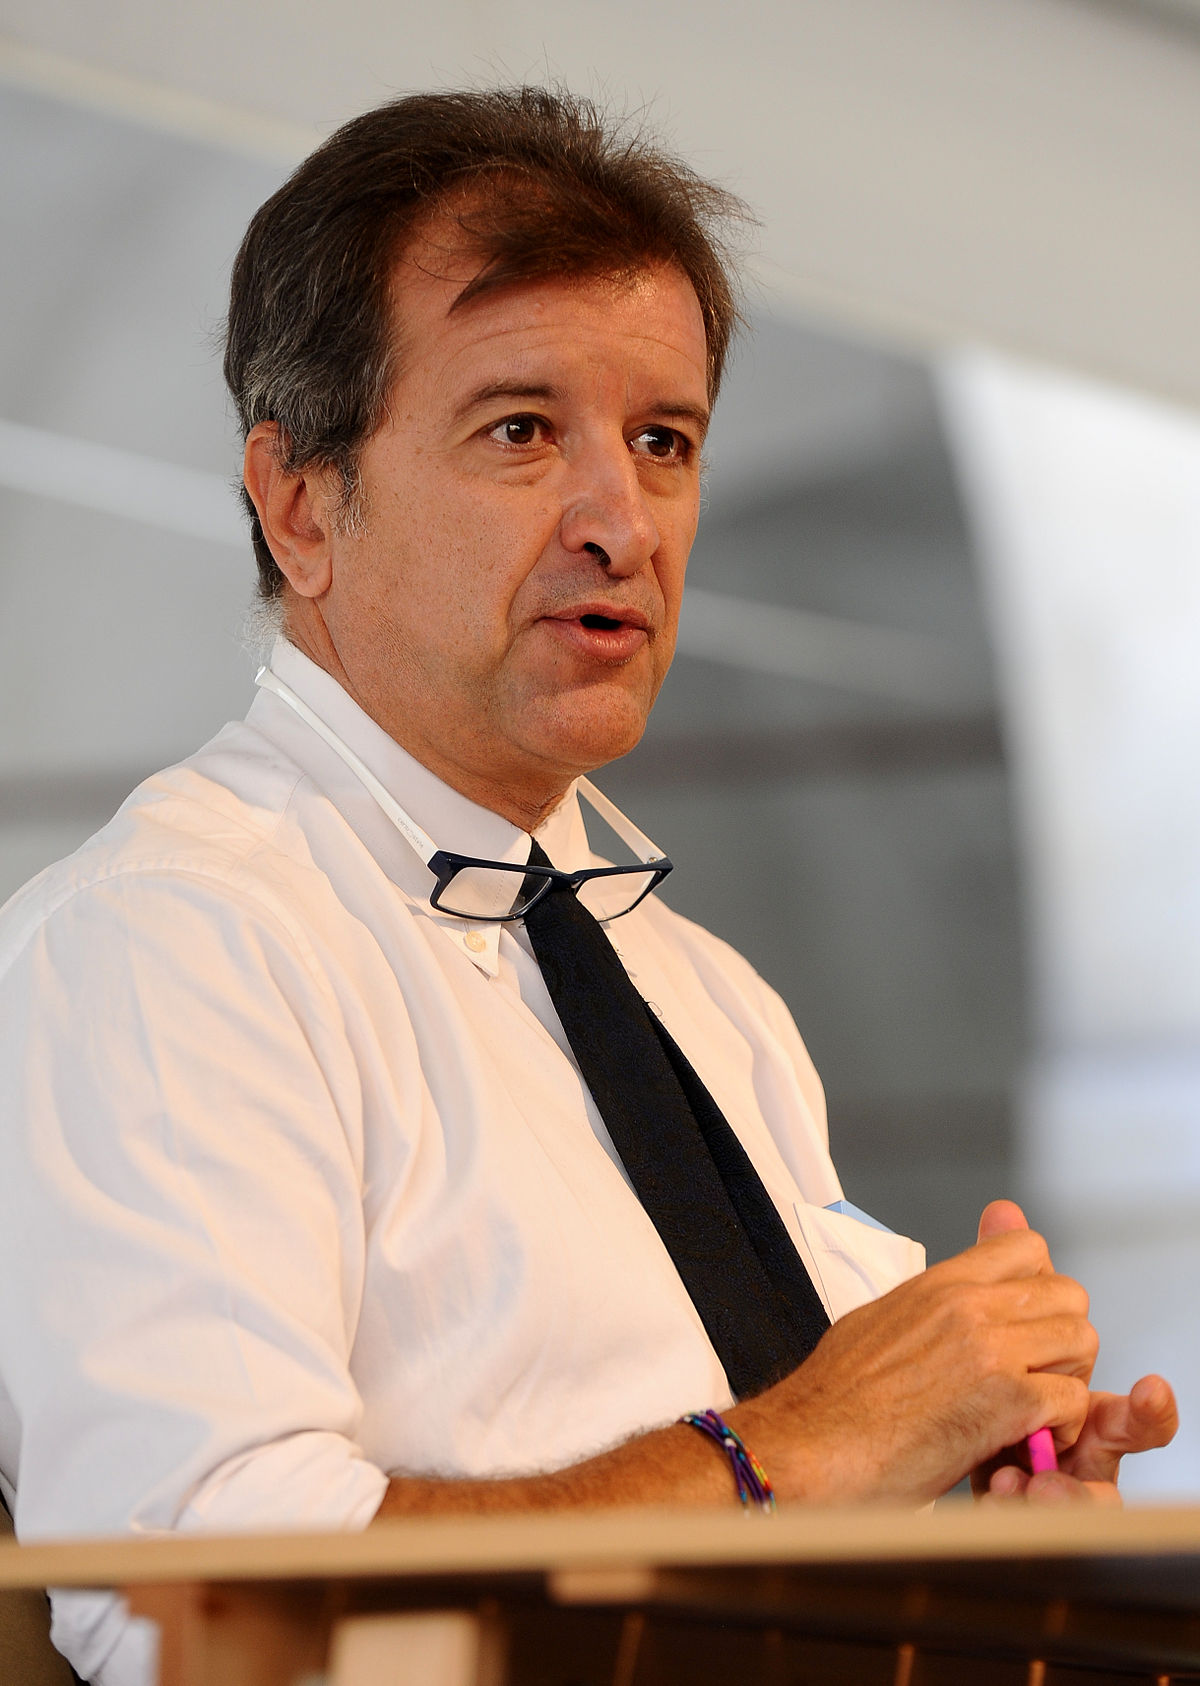 Andrea Fumagalli Economista Wikipedia